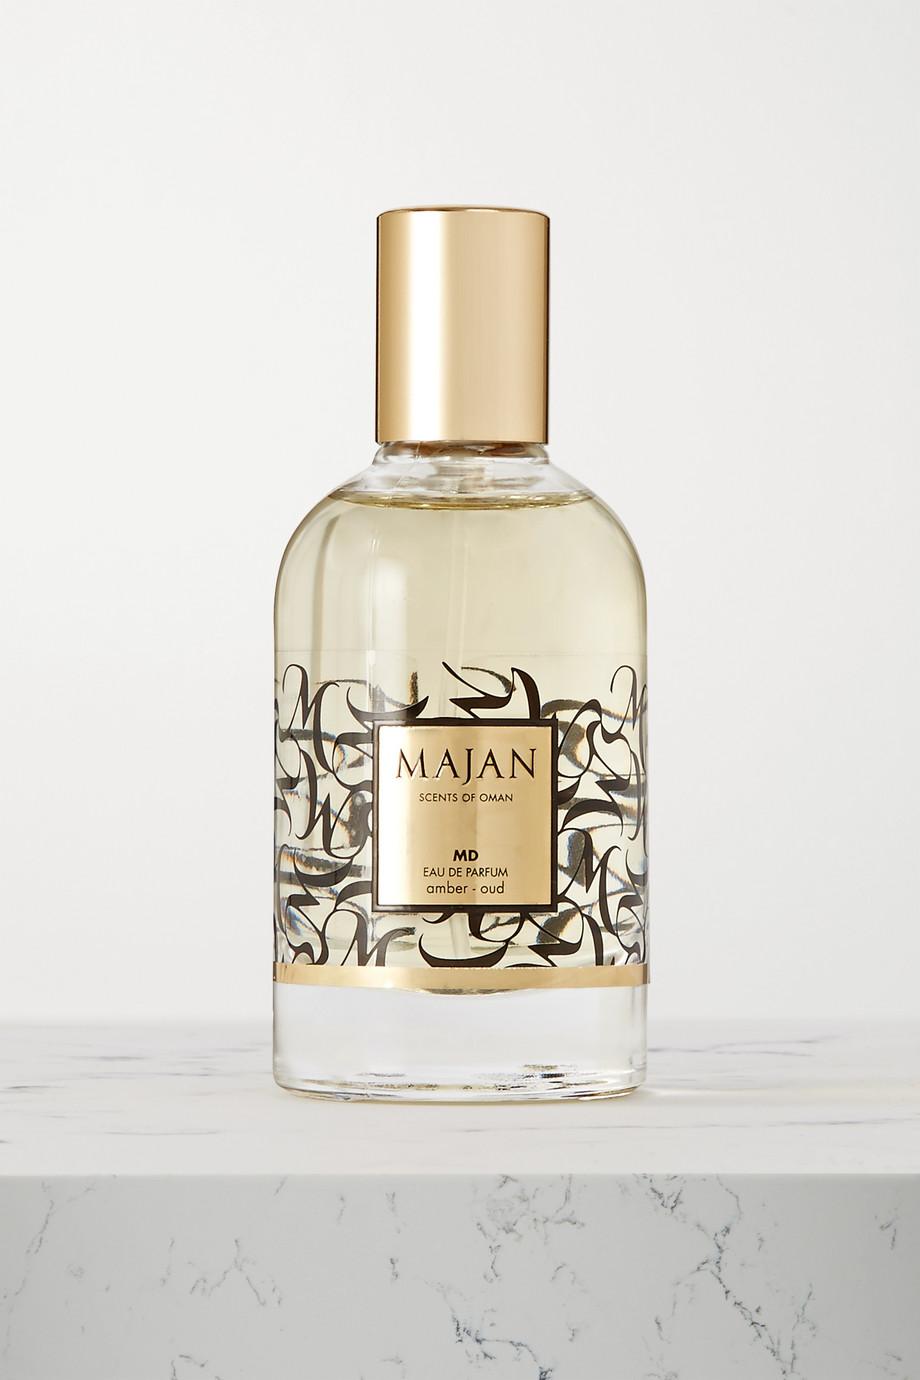 MAJAN MD, 50ml – Eau de Parfum